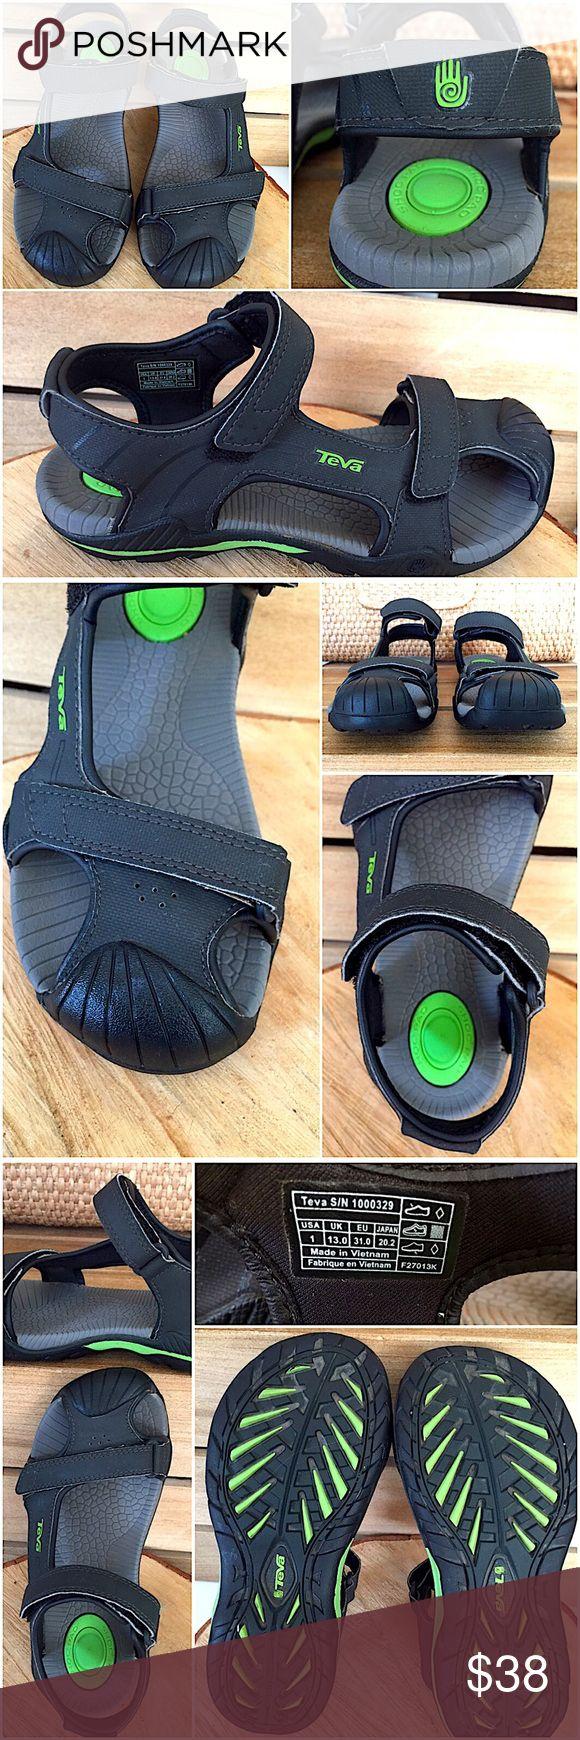 Selling this Teva Toachi 2 Youth Sport Sandal Unisex Stone Gray on Poshmark! My username is: ciao_sydney. #shopmycloset #poshmark #fashion #shopping #style #forsale #Teva #Other